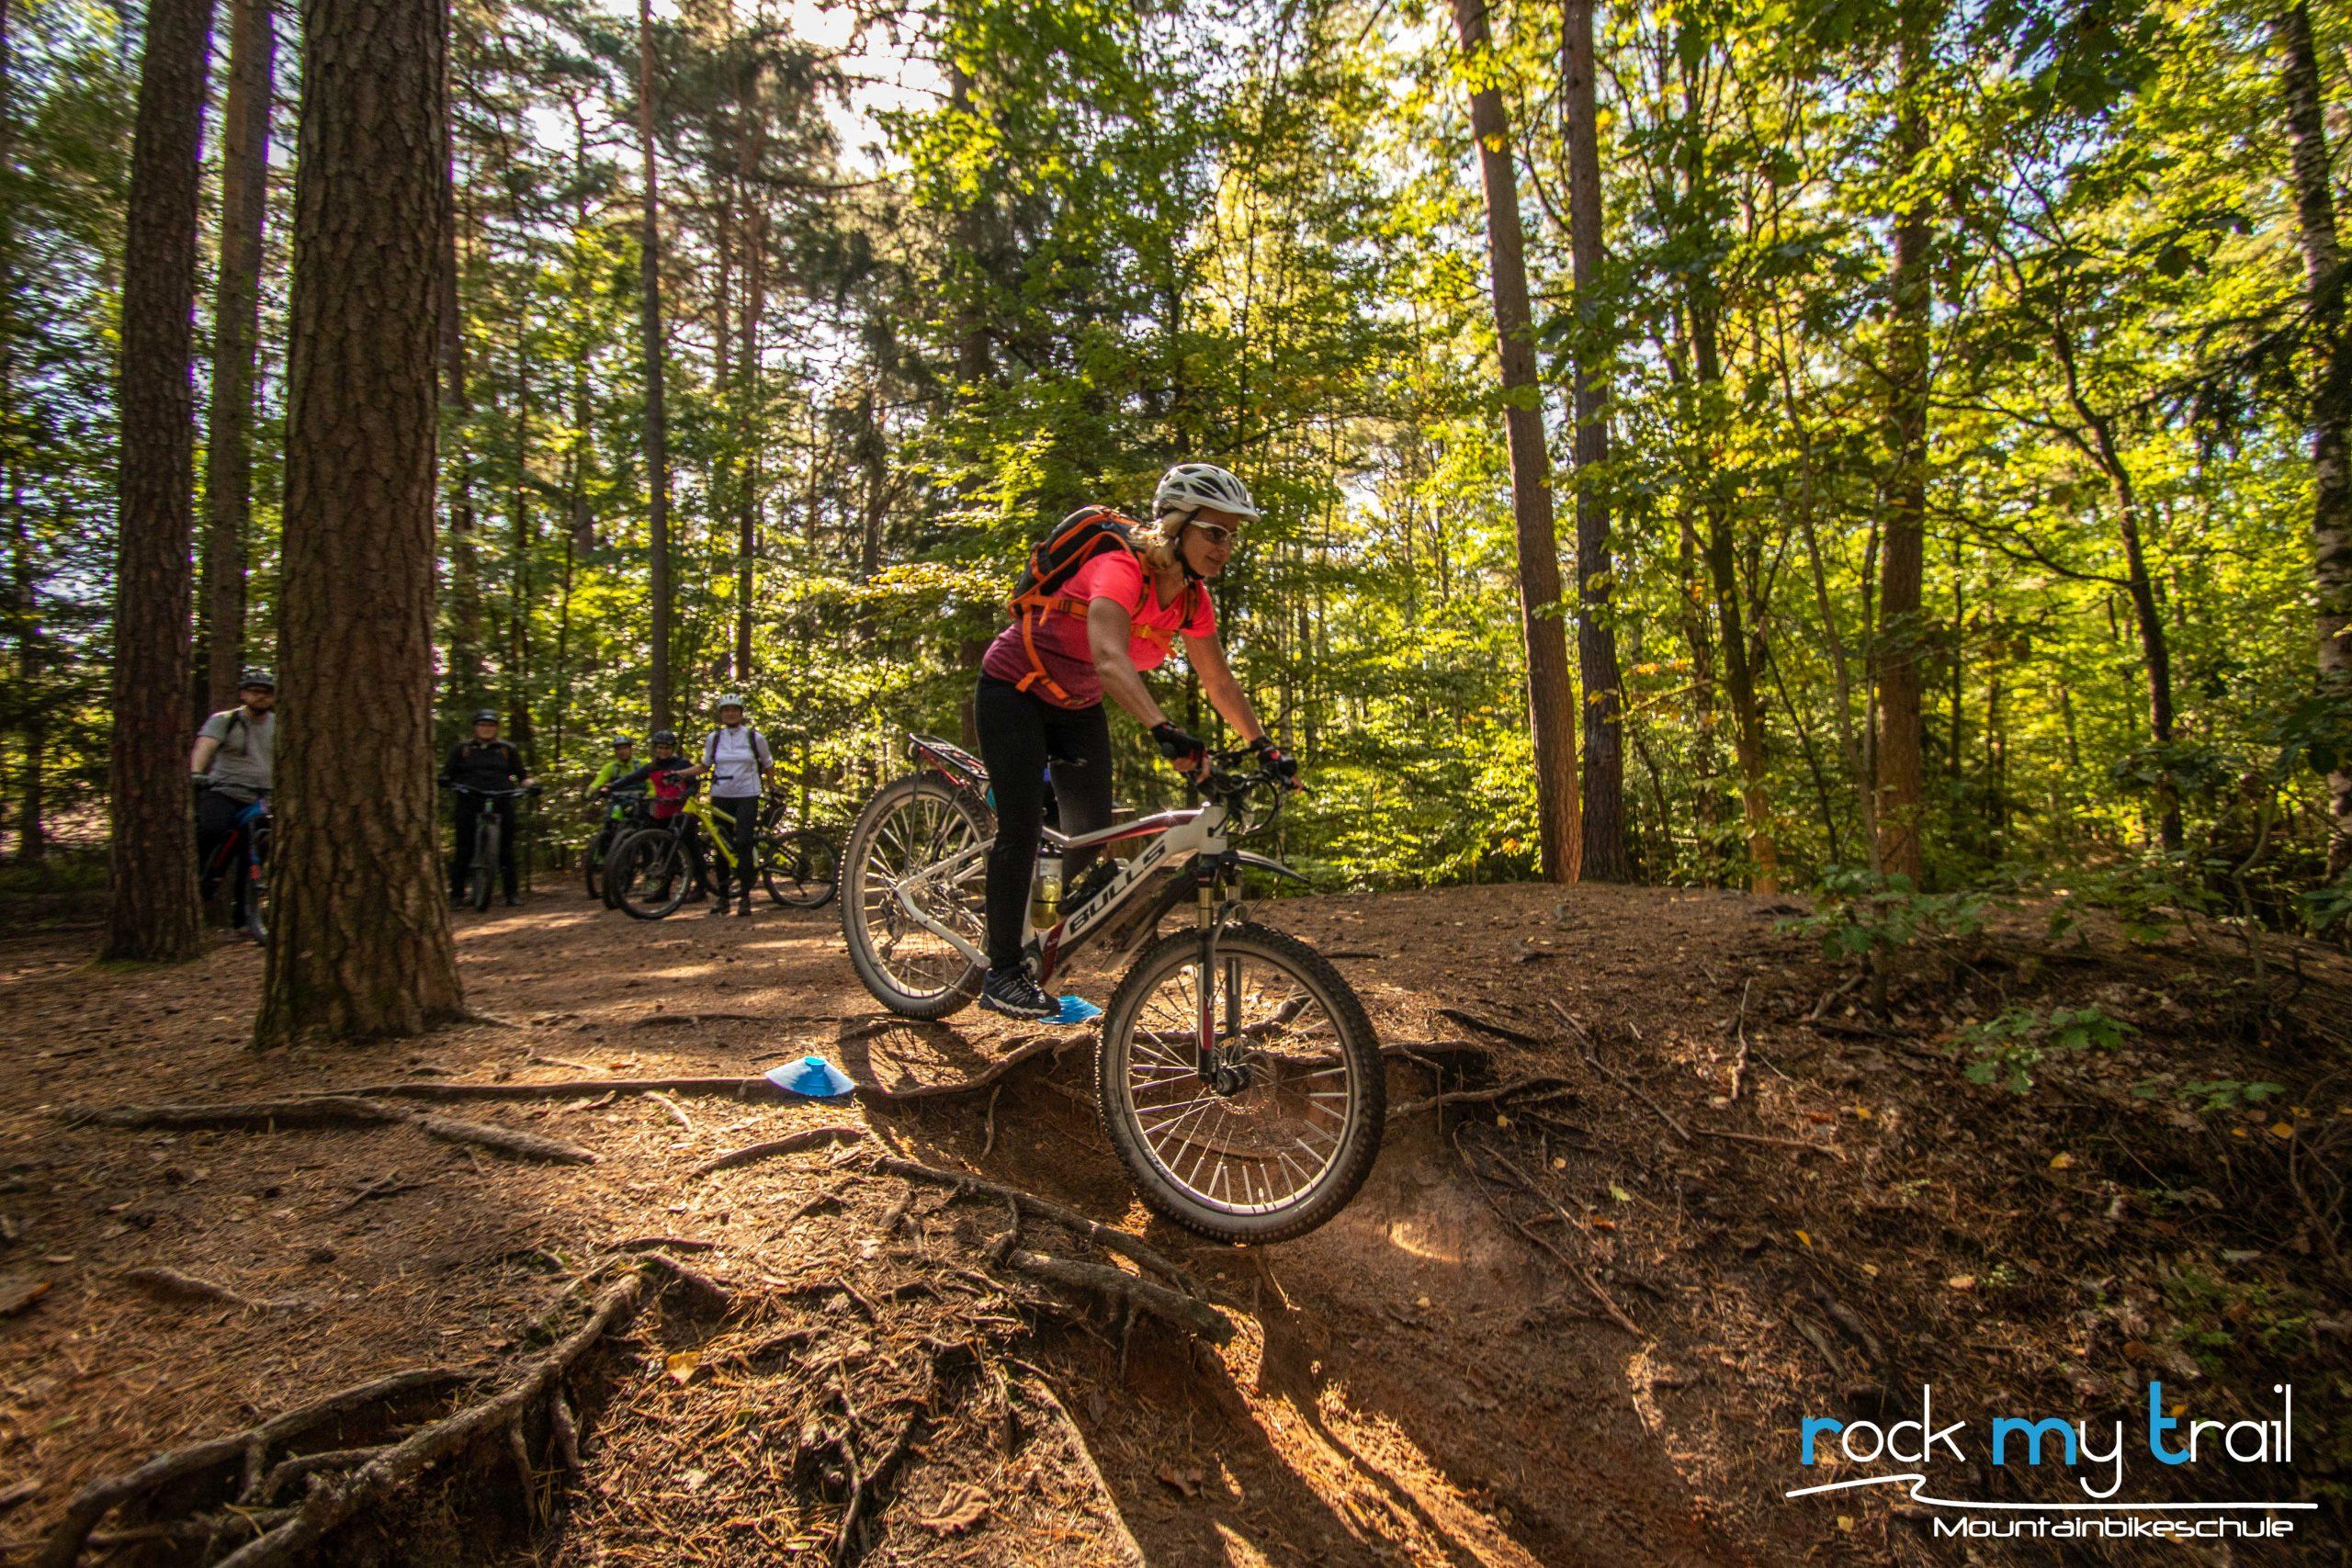 eMTB Basic Fahrtechnik Kurs Rock my Trail Bikeschule